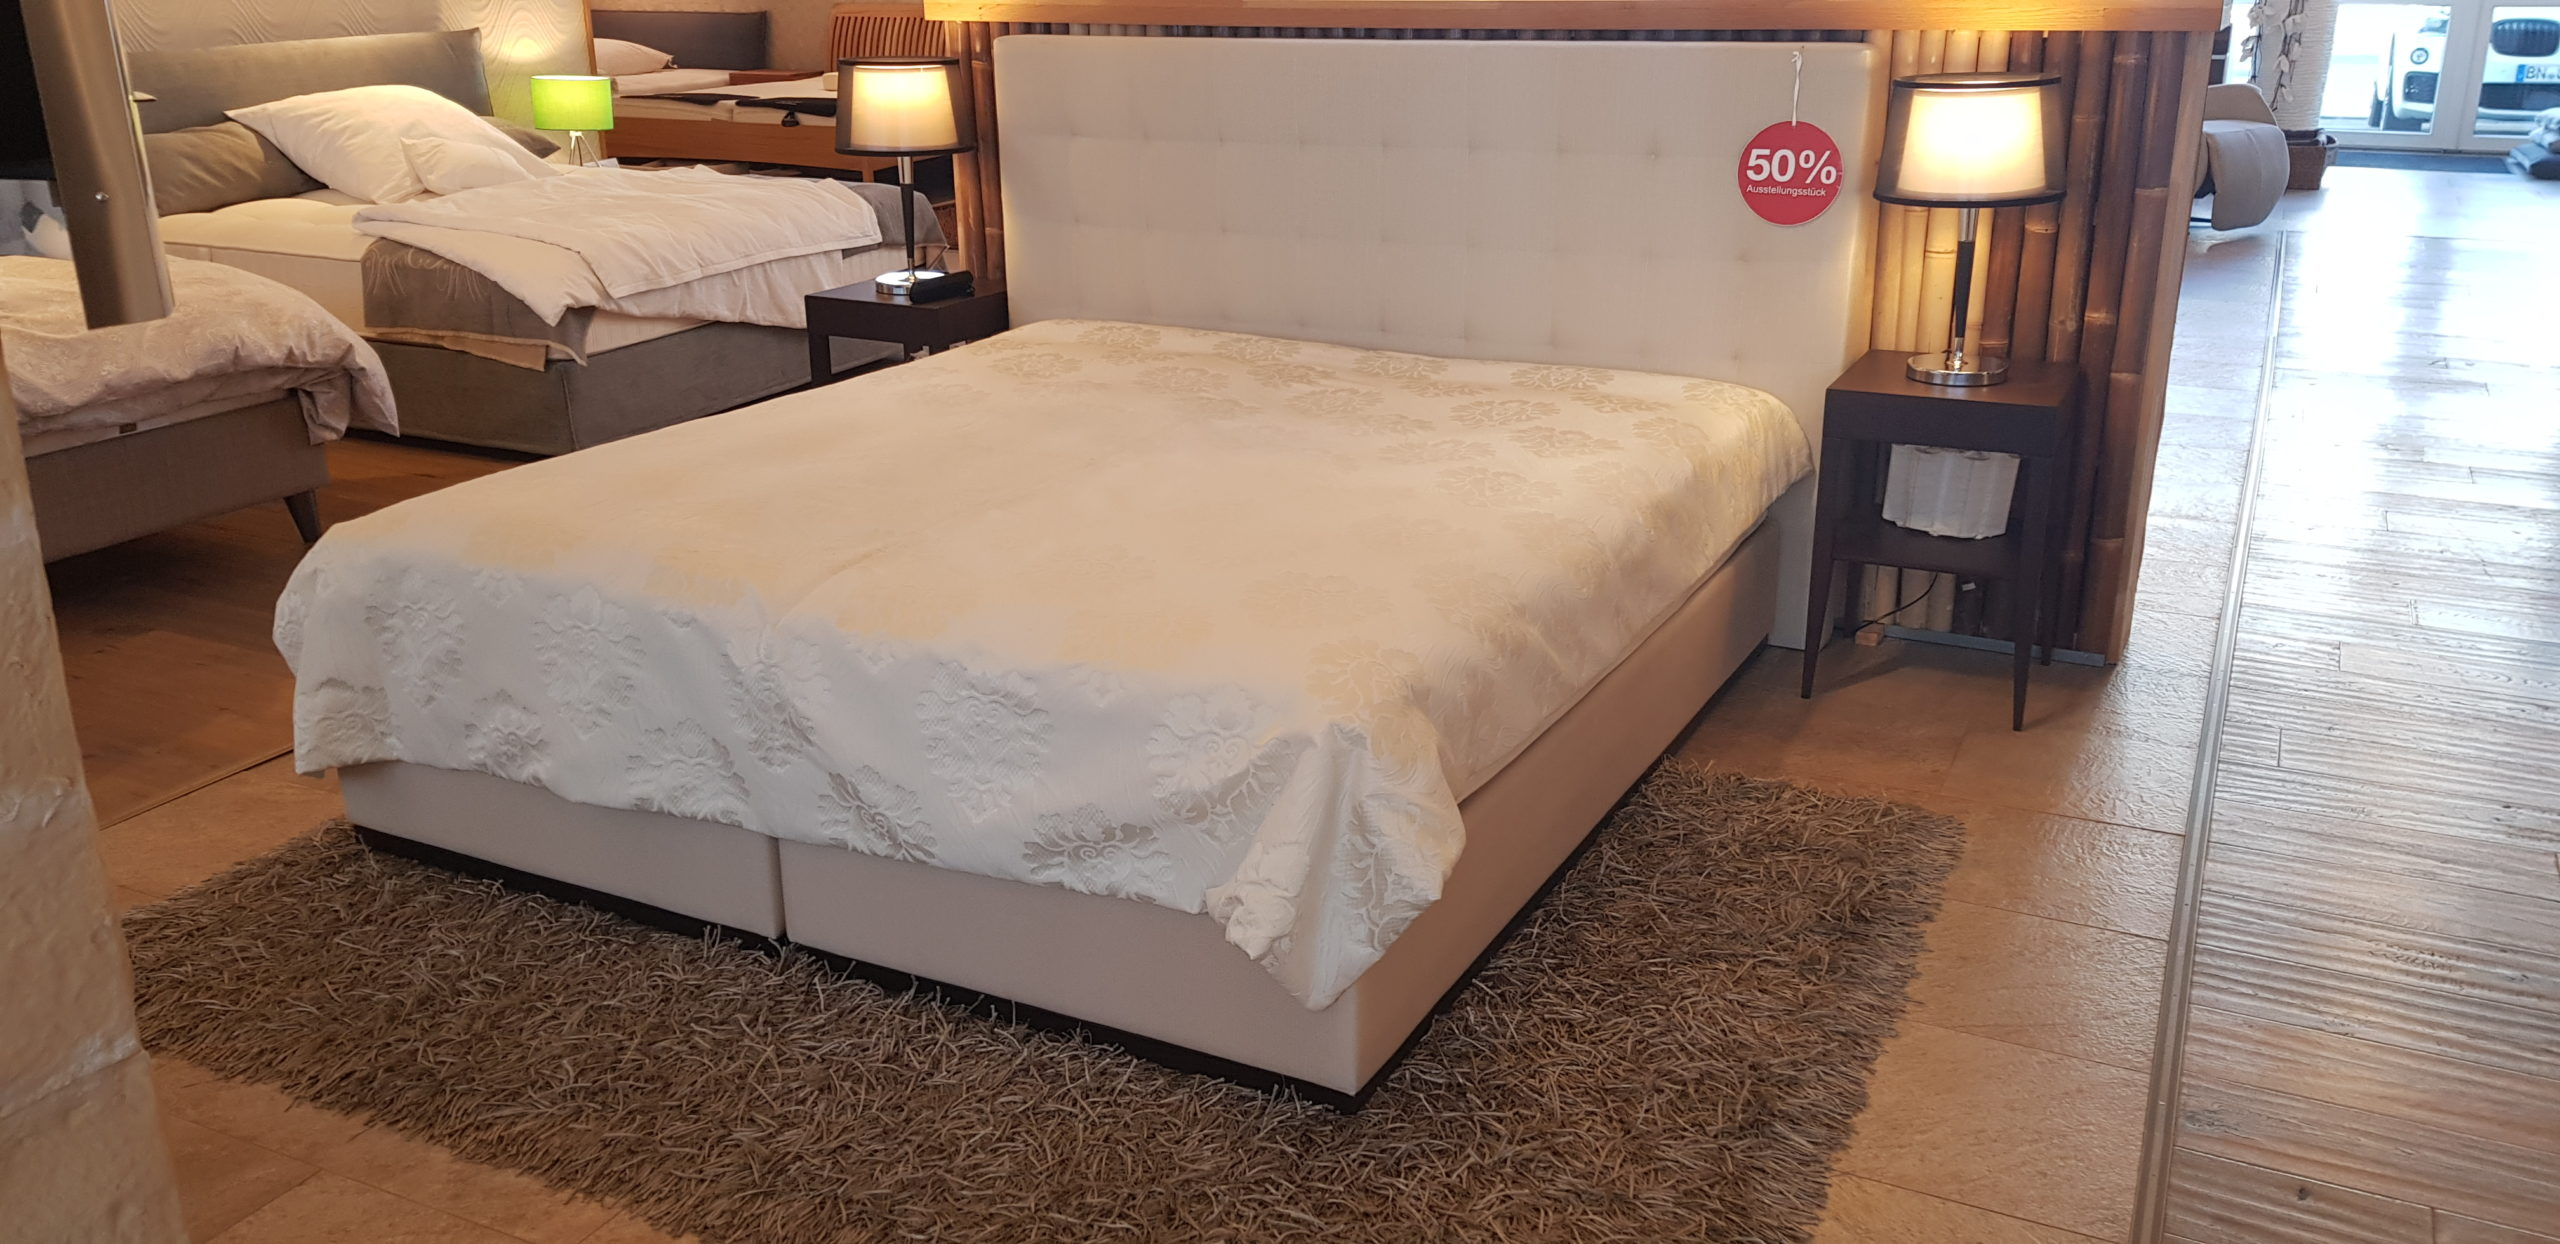 Sleeping Art Bonn : espace carre ausstellungsst ck sleeping art bonn ~ A.2002-acura-tl-radio.info Haus und Dekorationen